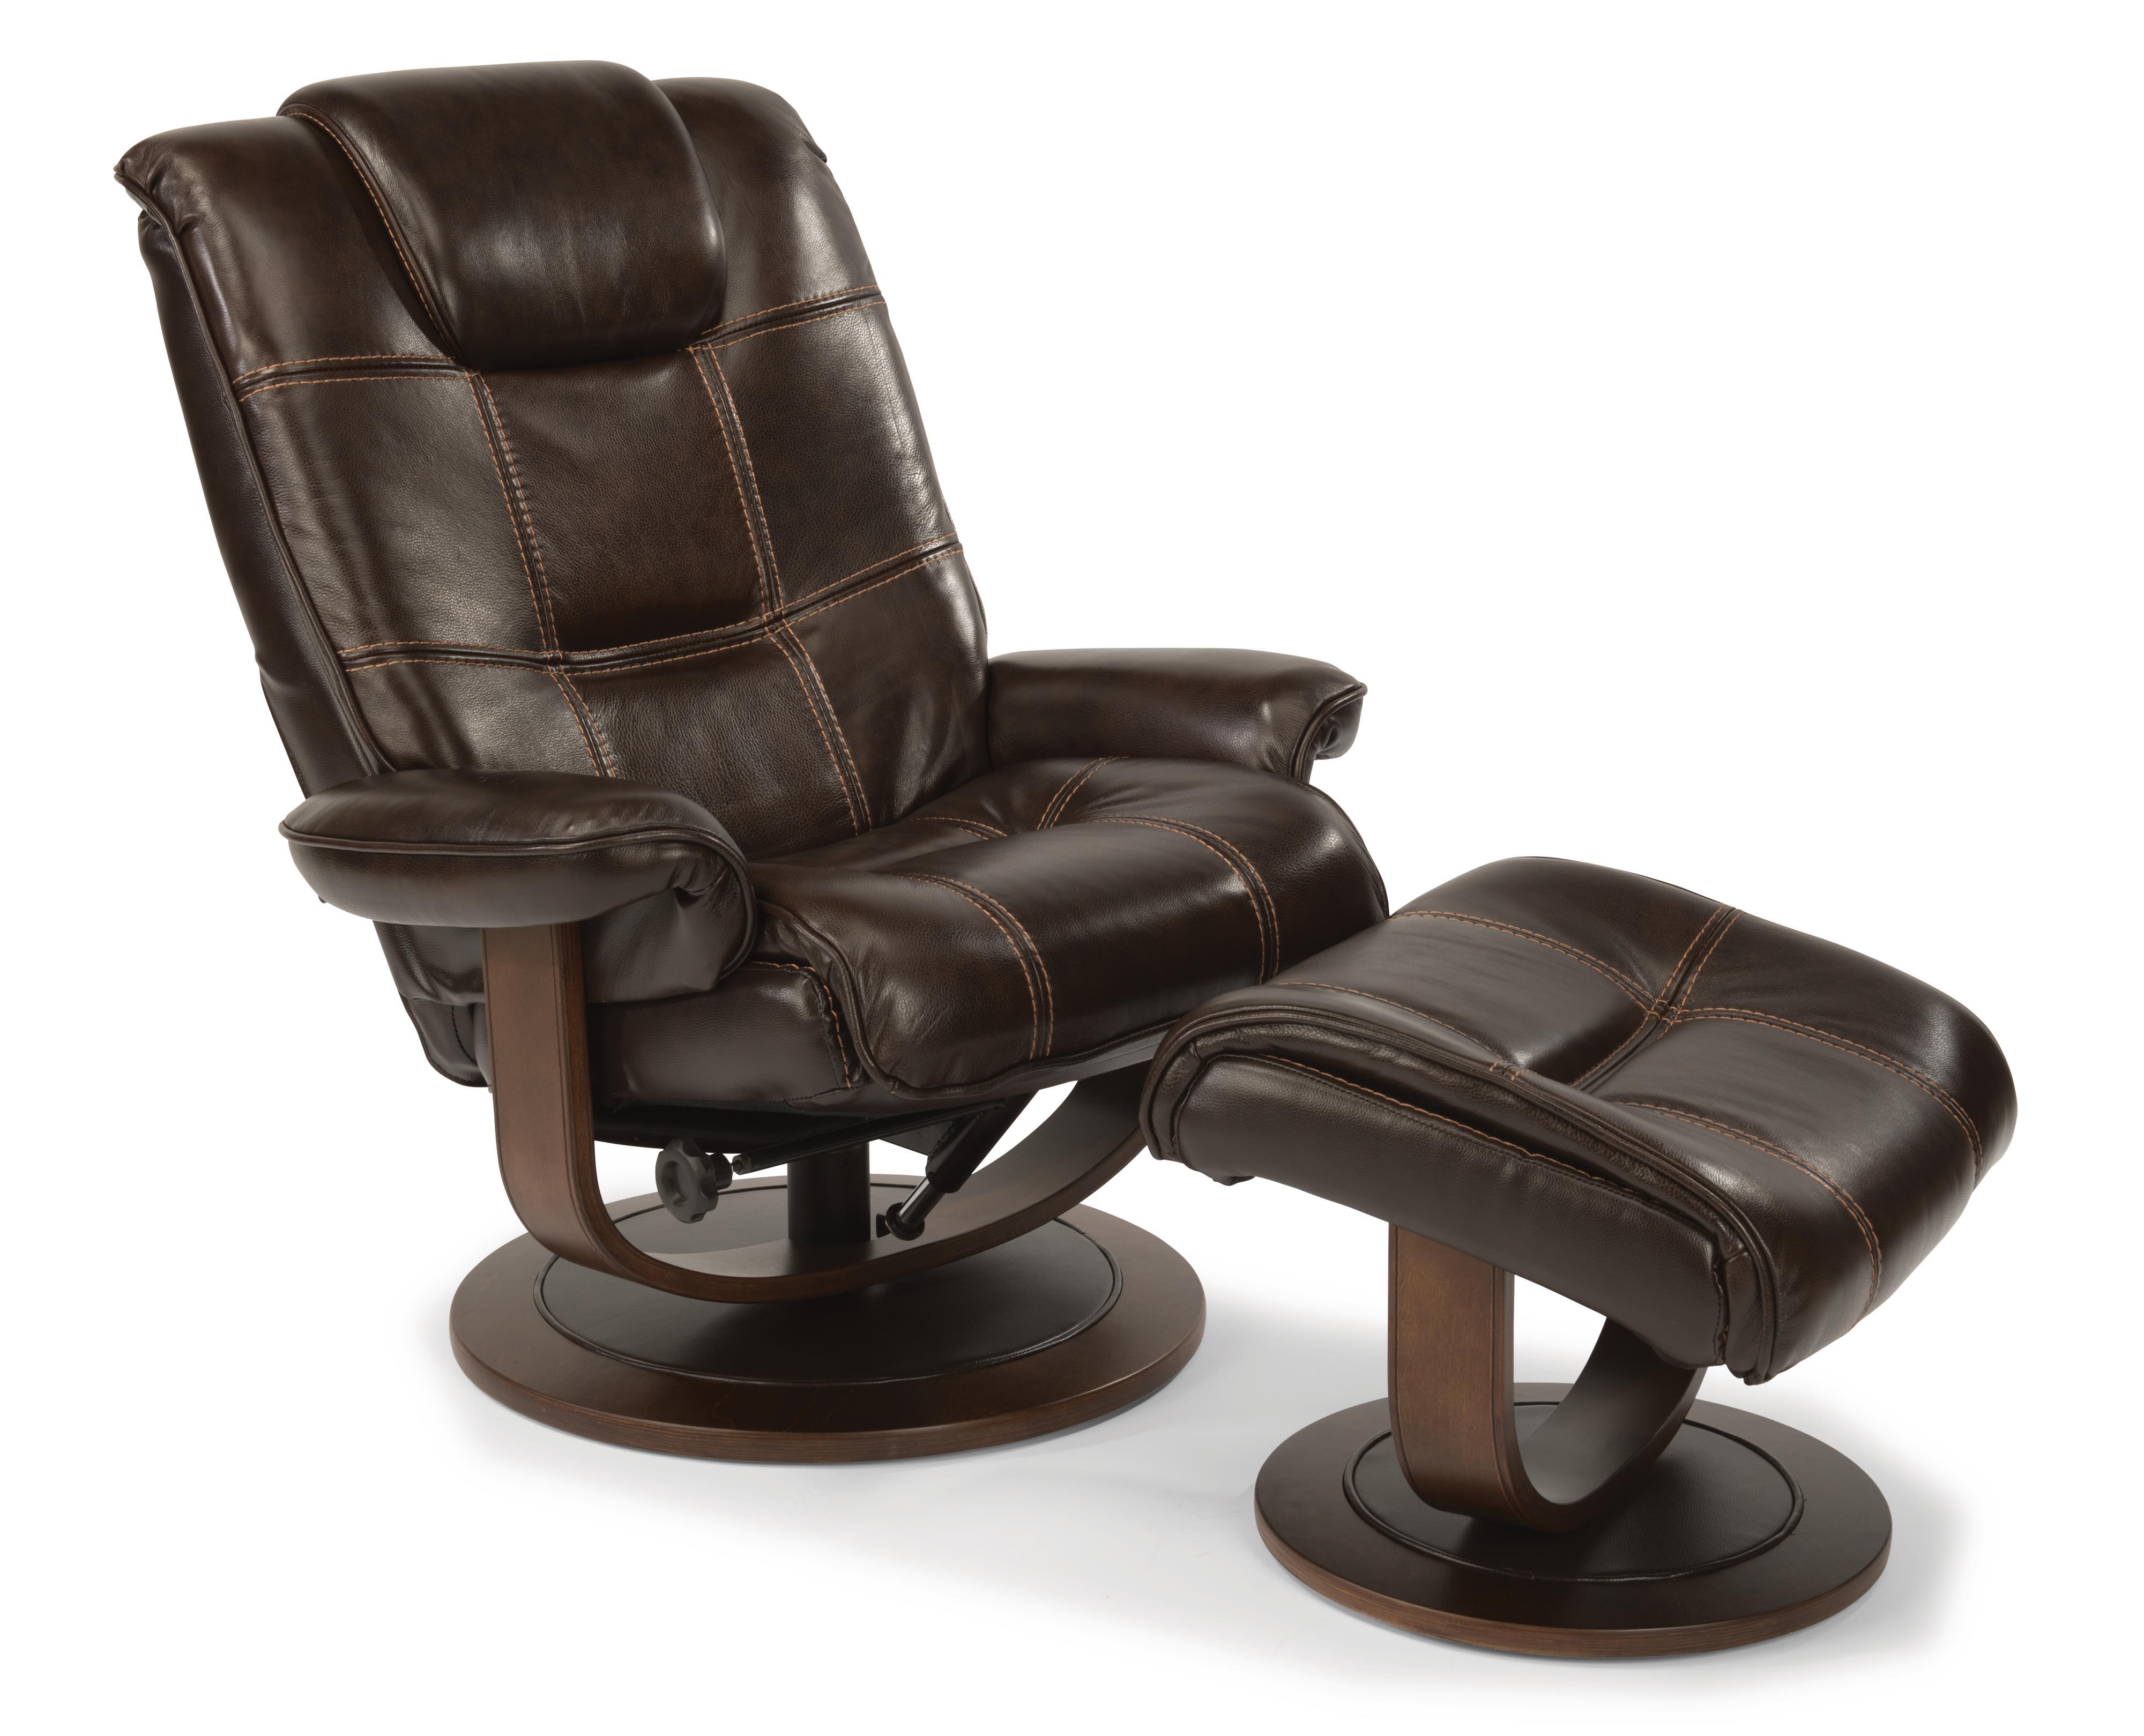 recliner vs chair with ottoman spandex covers ebay flexsteel latitudes spencer 1457 co modern zero